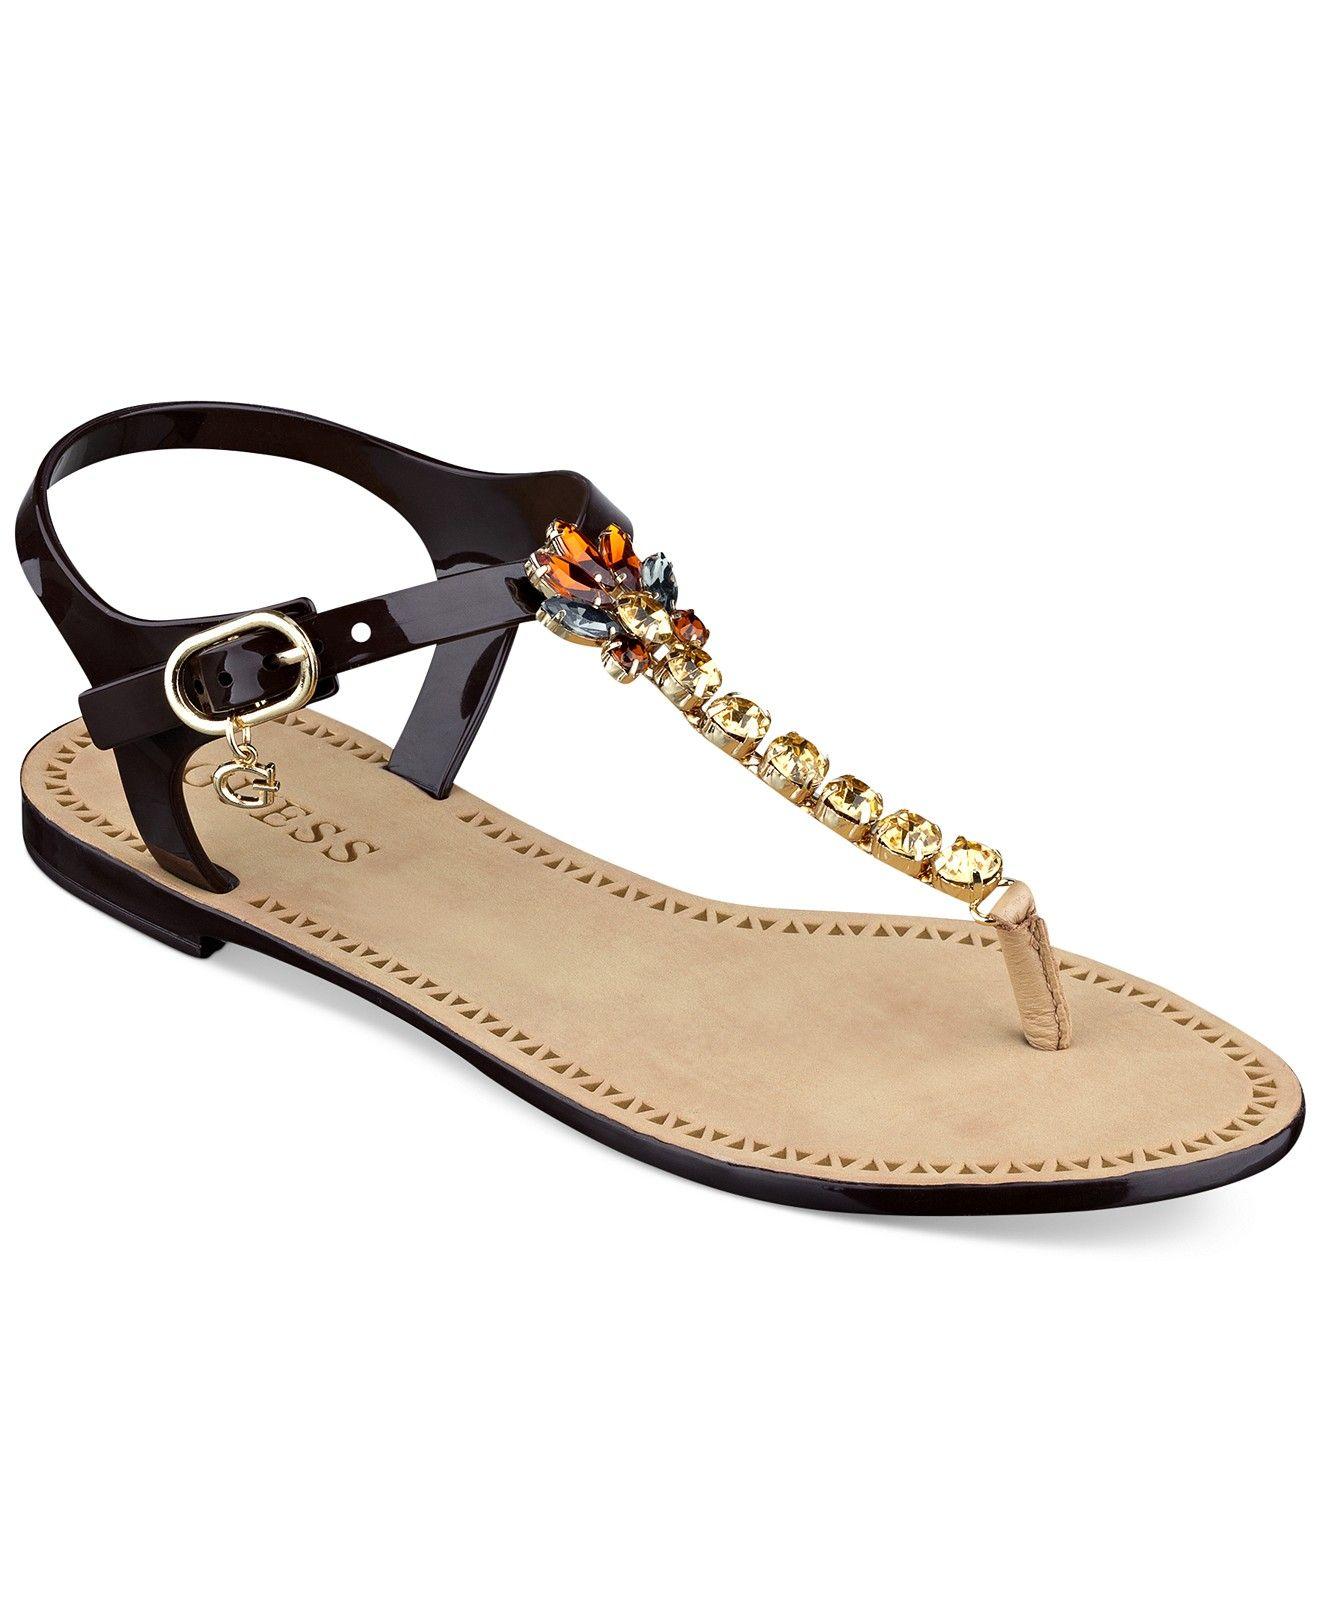 3a6b06d559d GUESS Women s Adona Flat Chain Thong Sandals - Sandals - Shoes - Macy s